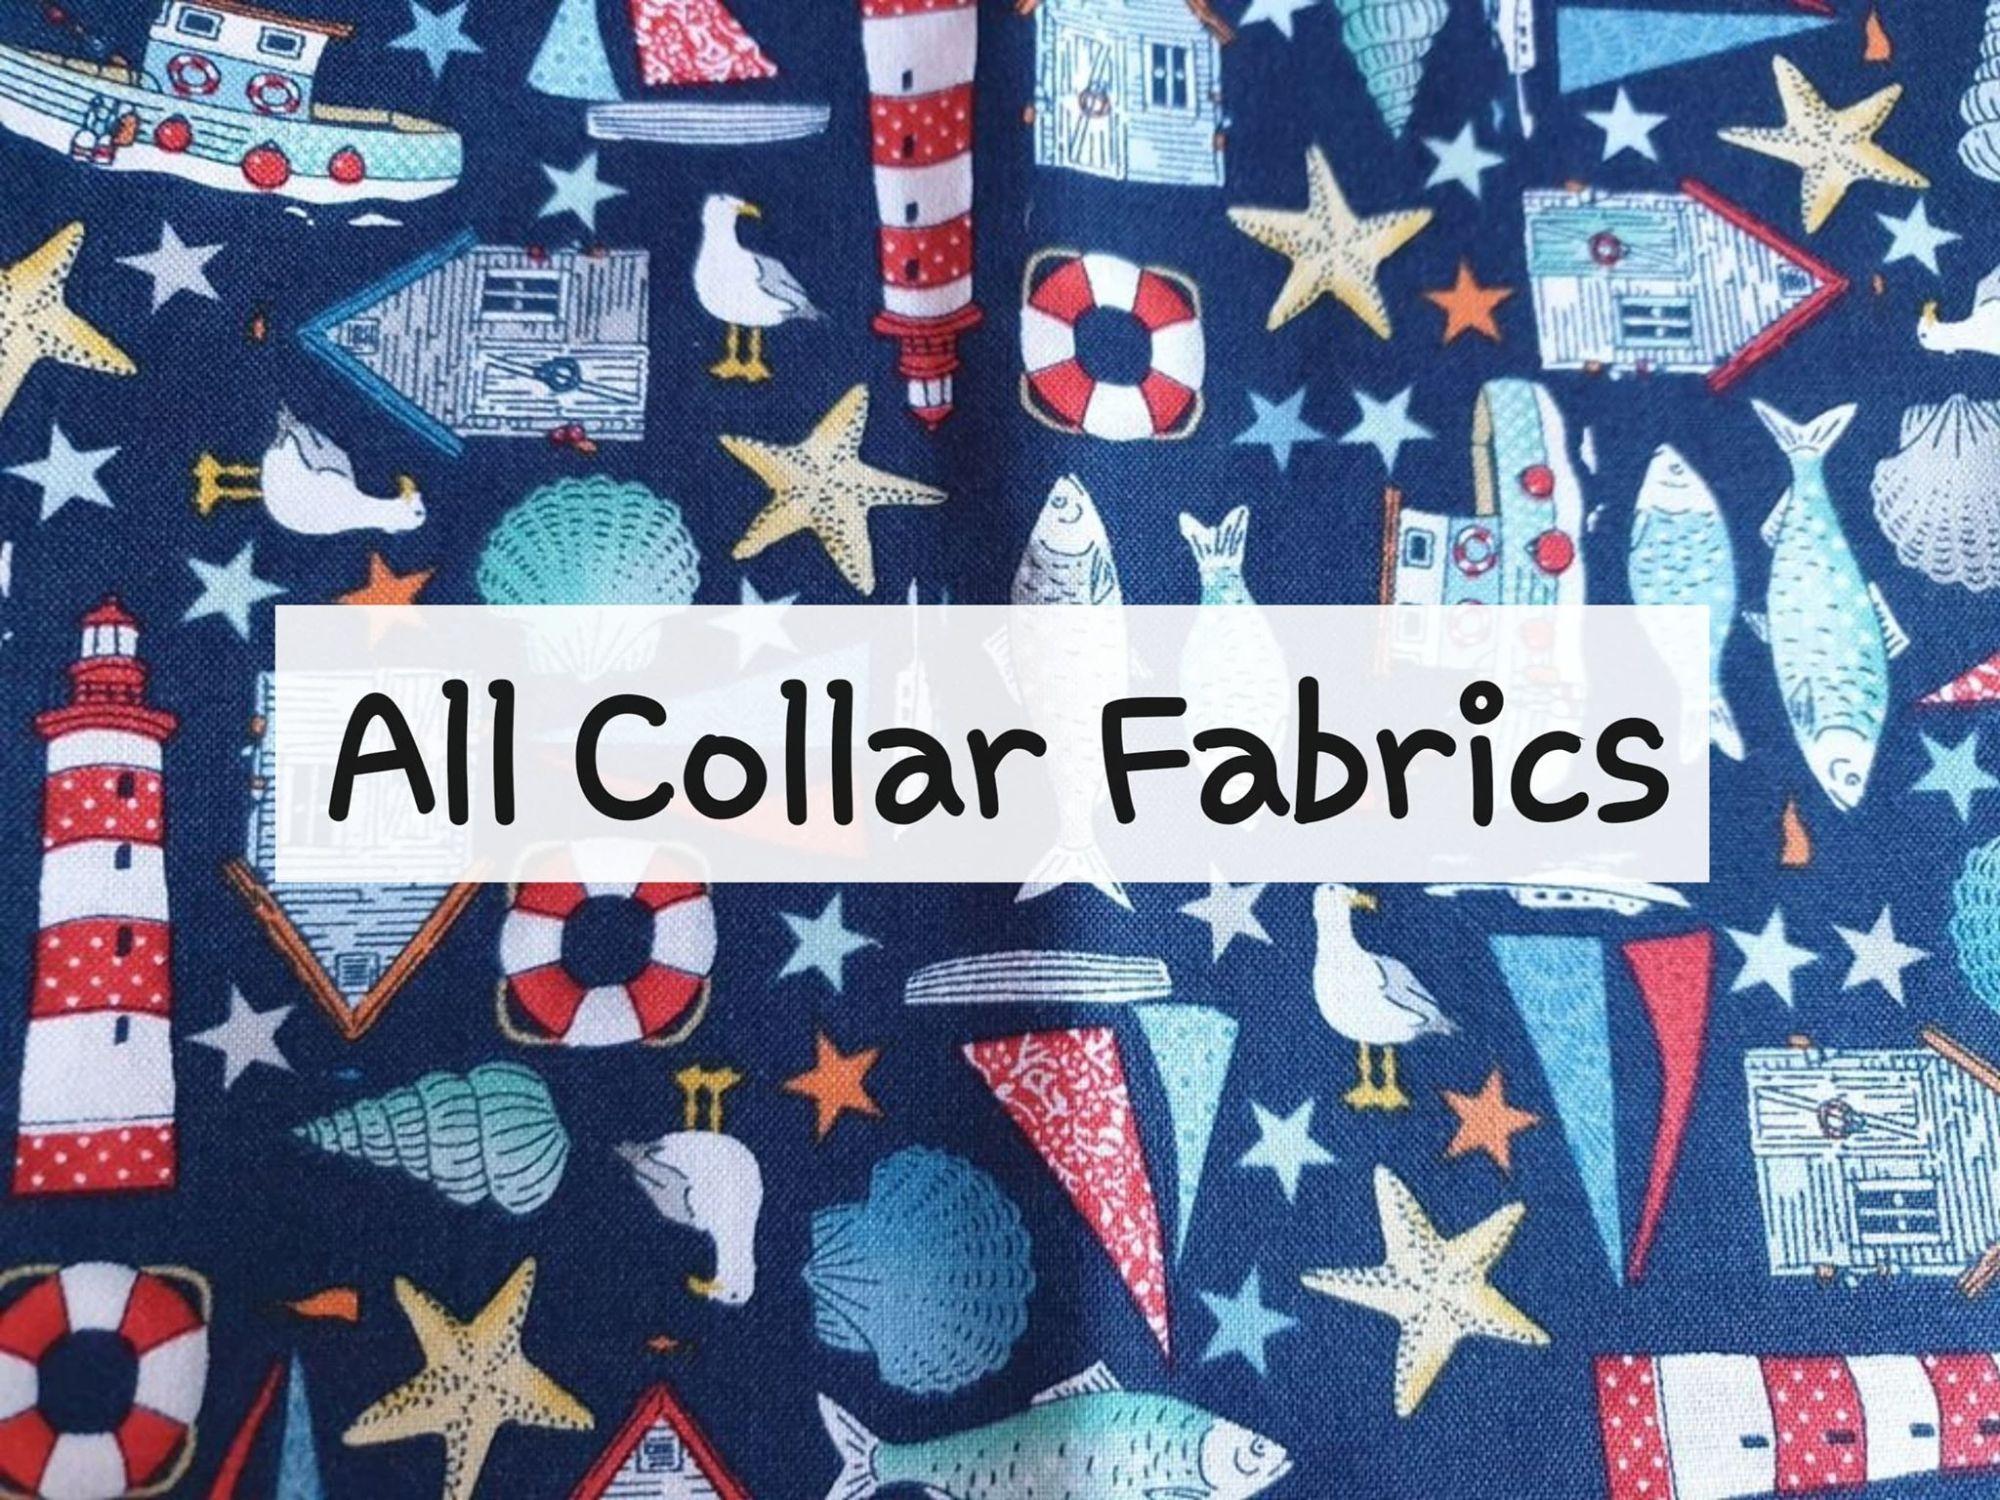 All Collar Fabrics